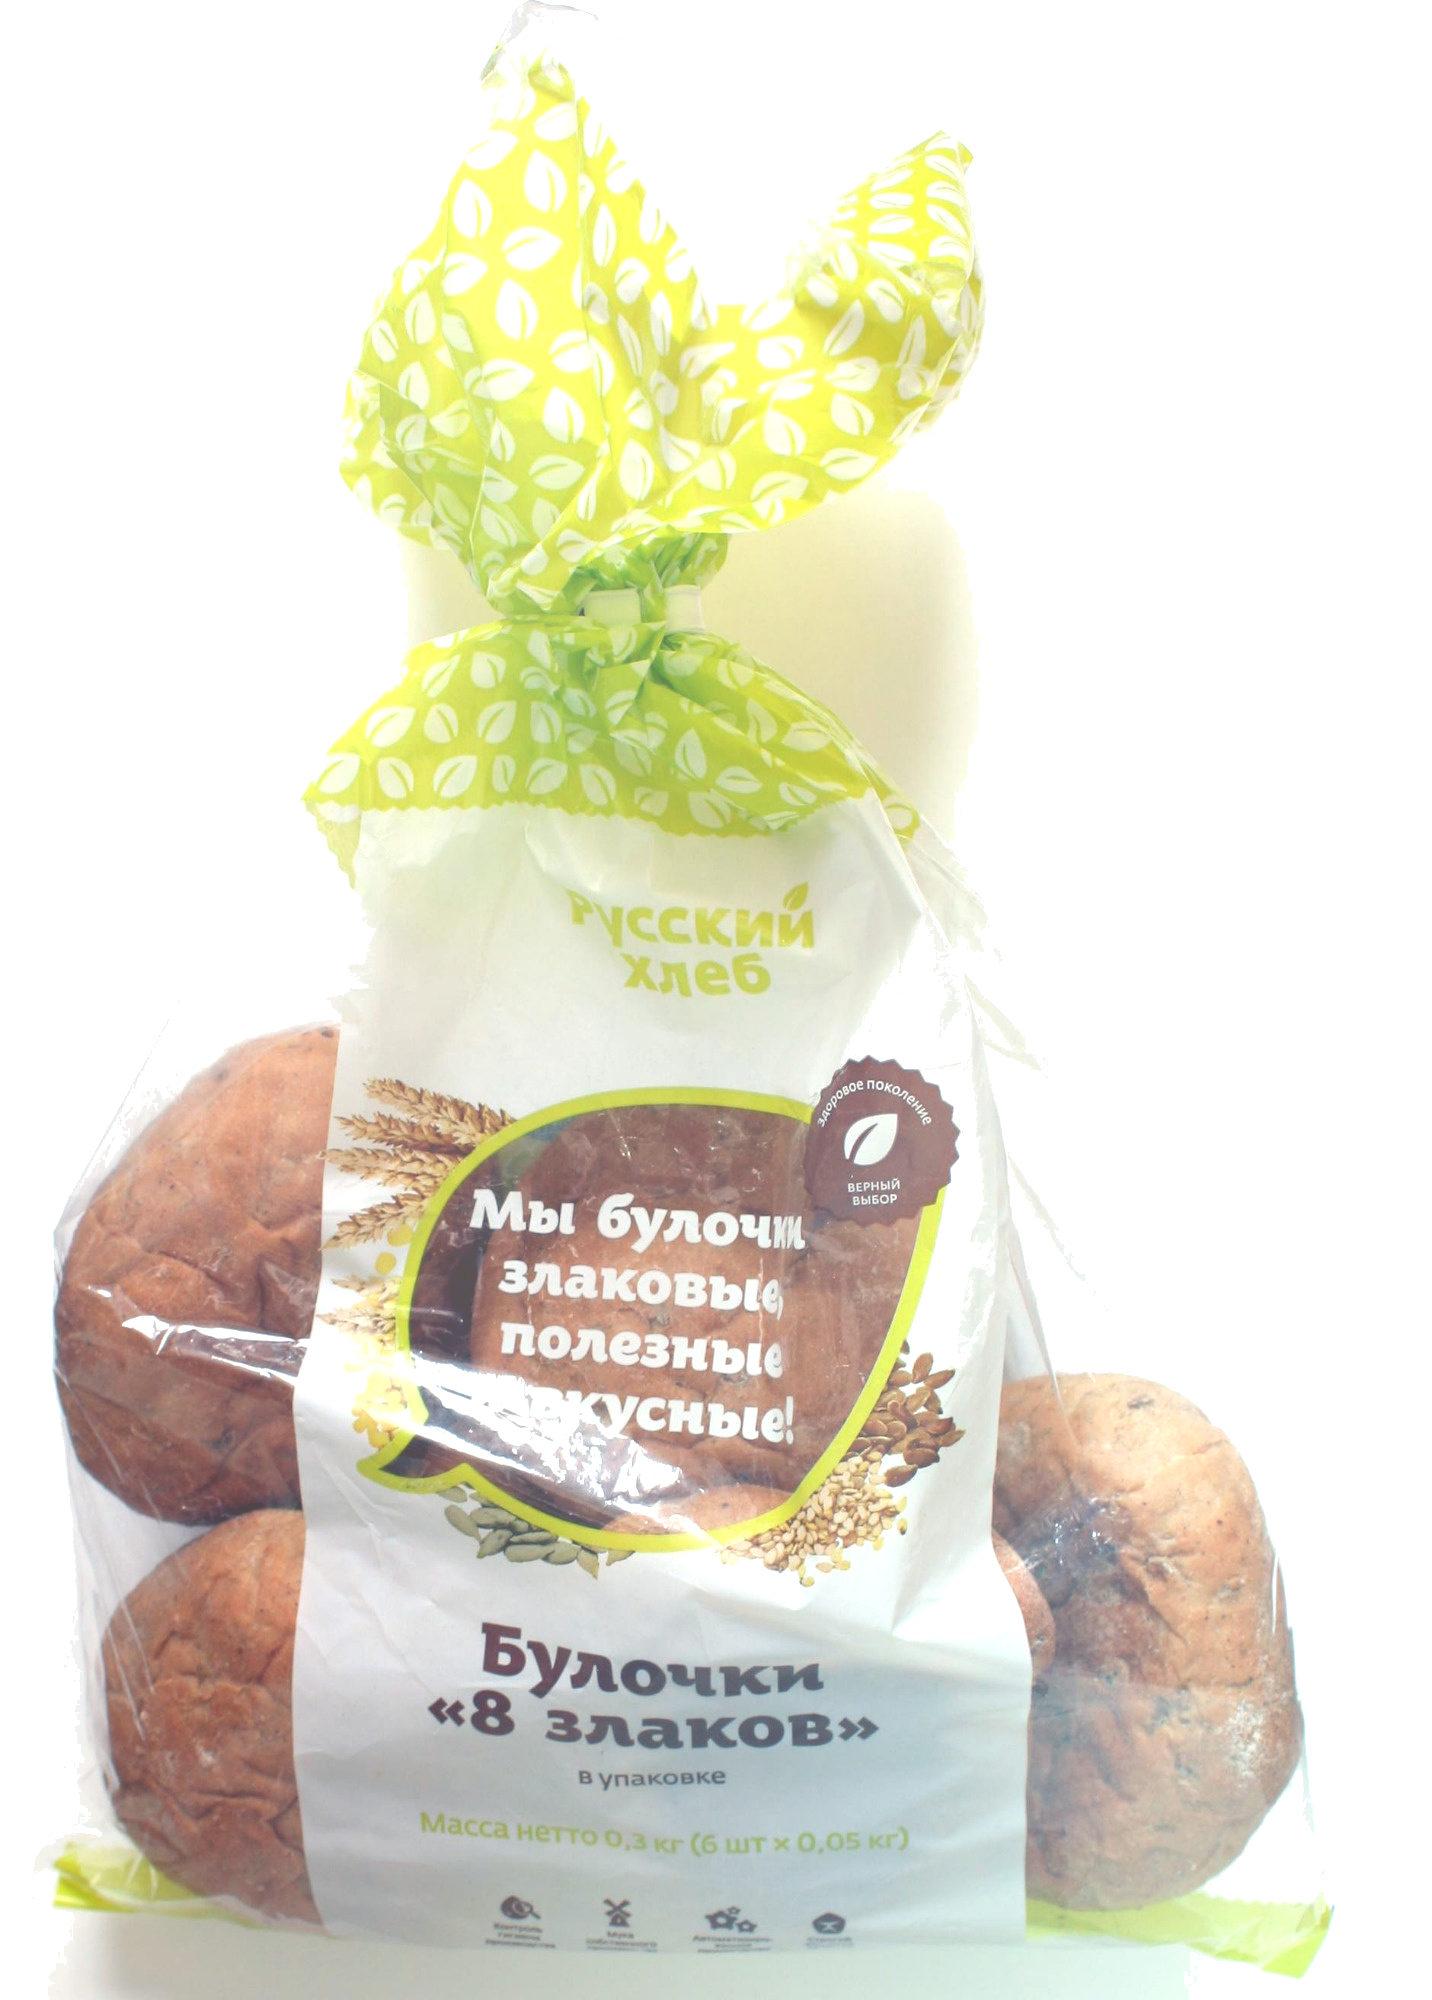 Булочки «8 злаков» - Product - ru